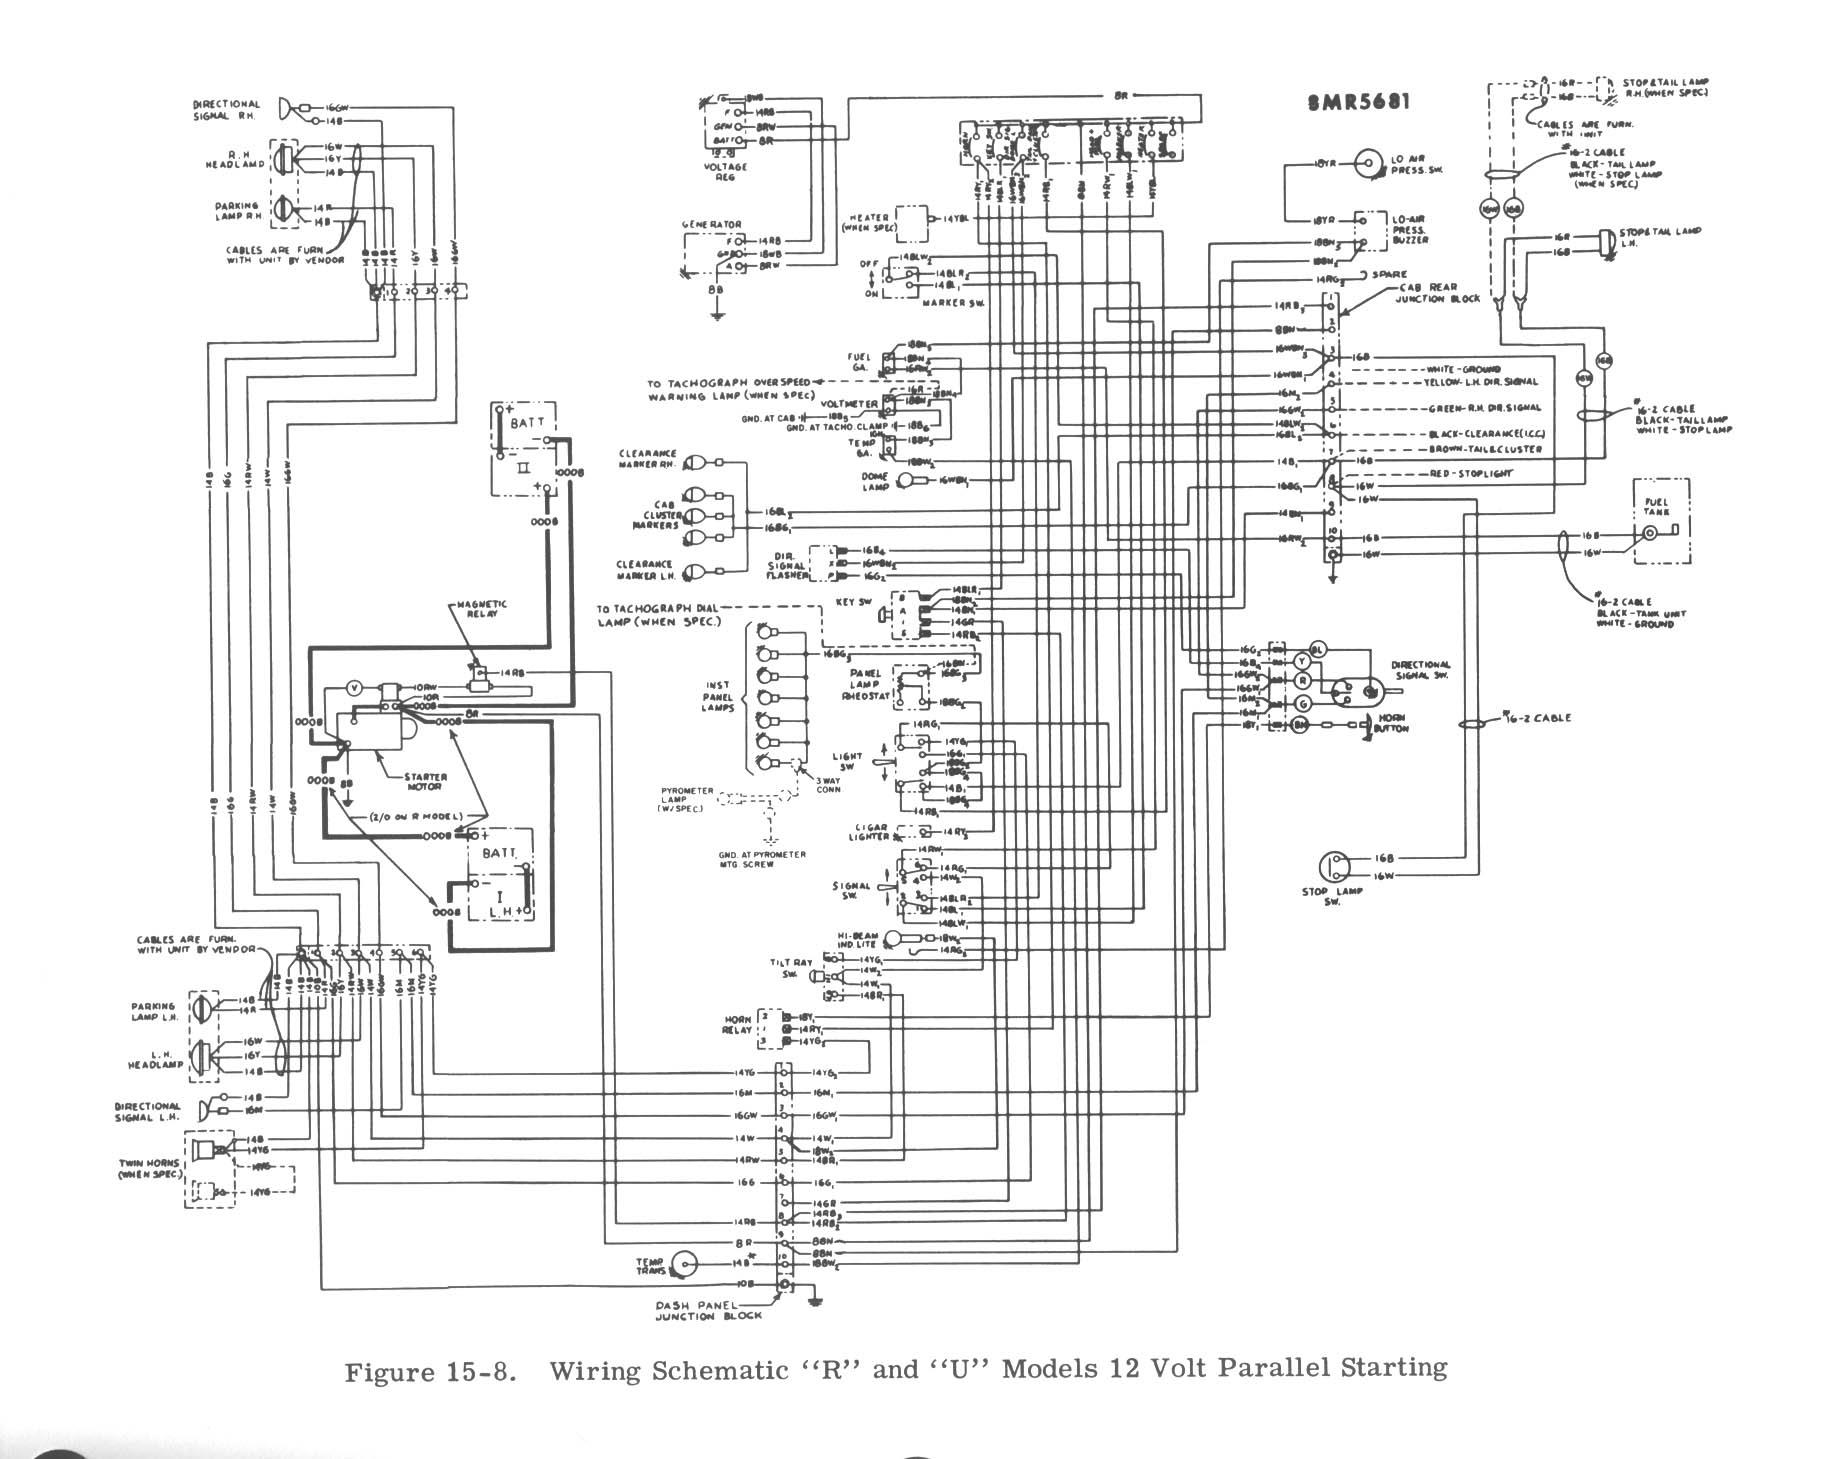 wiring diagrams for trucks kubota starter solenoid diagram hino 19 images